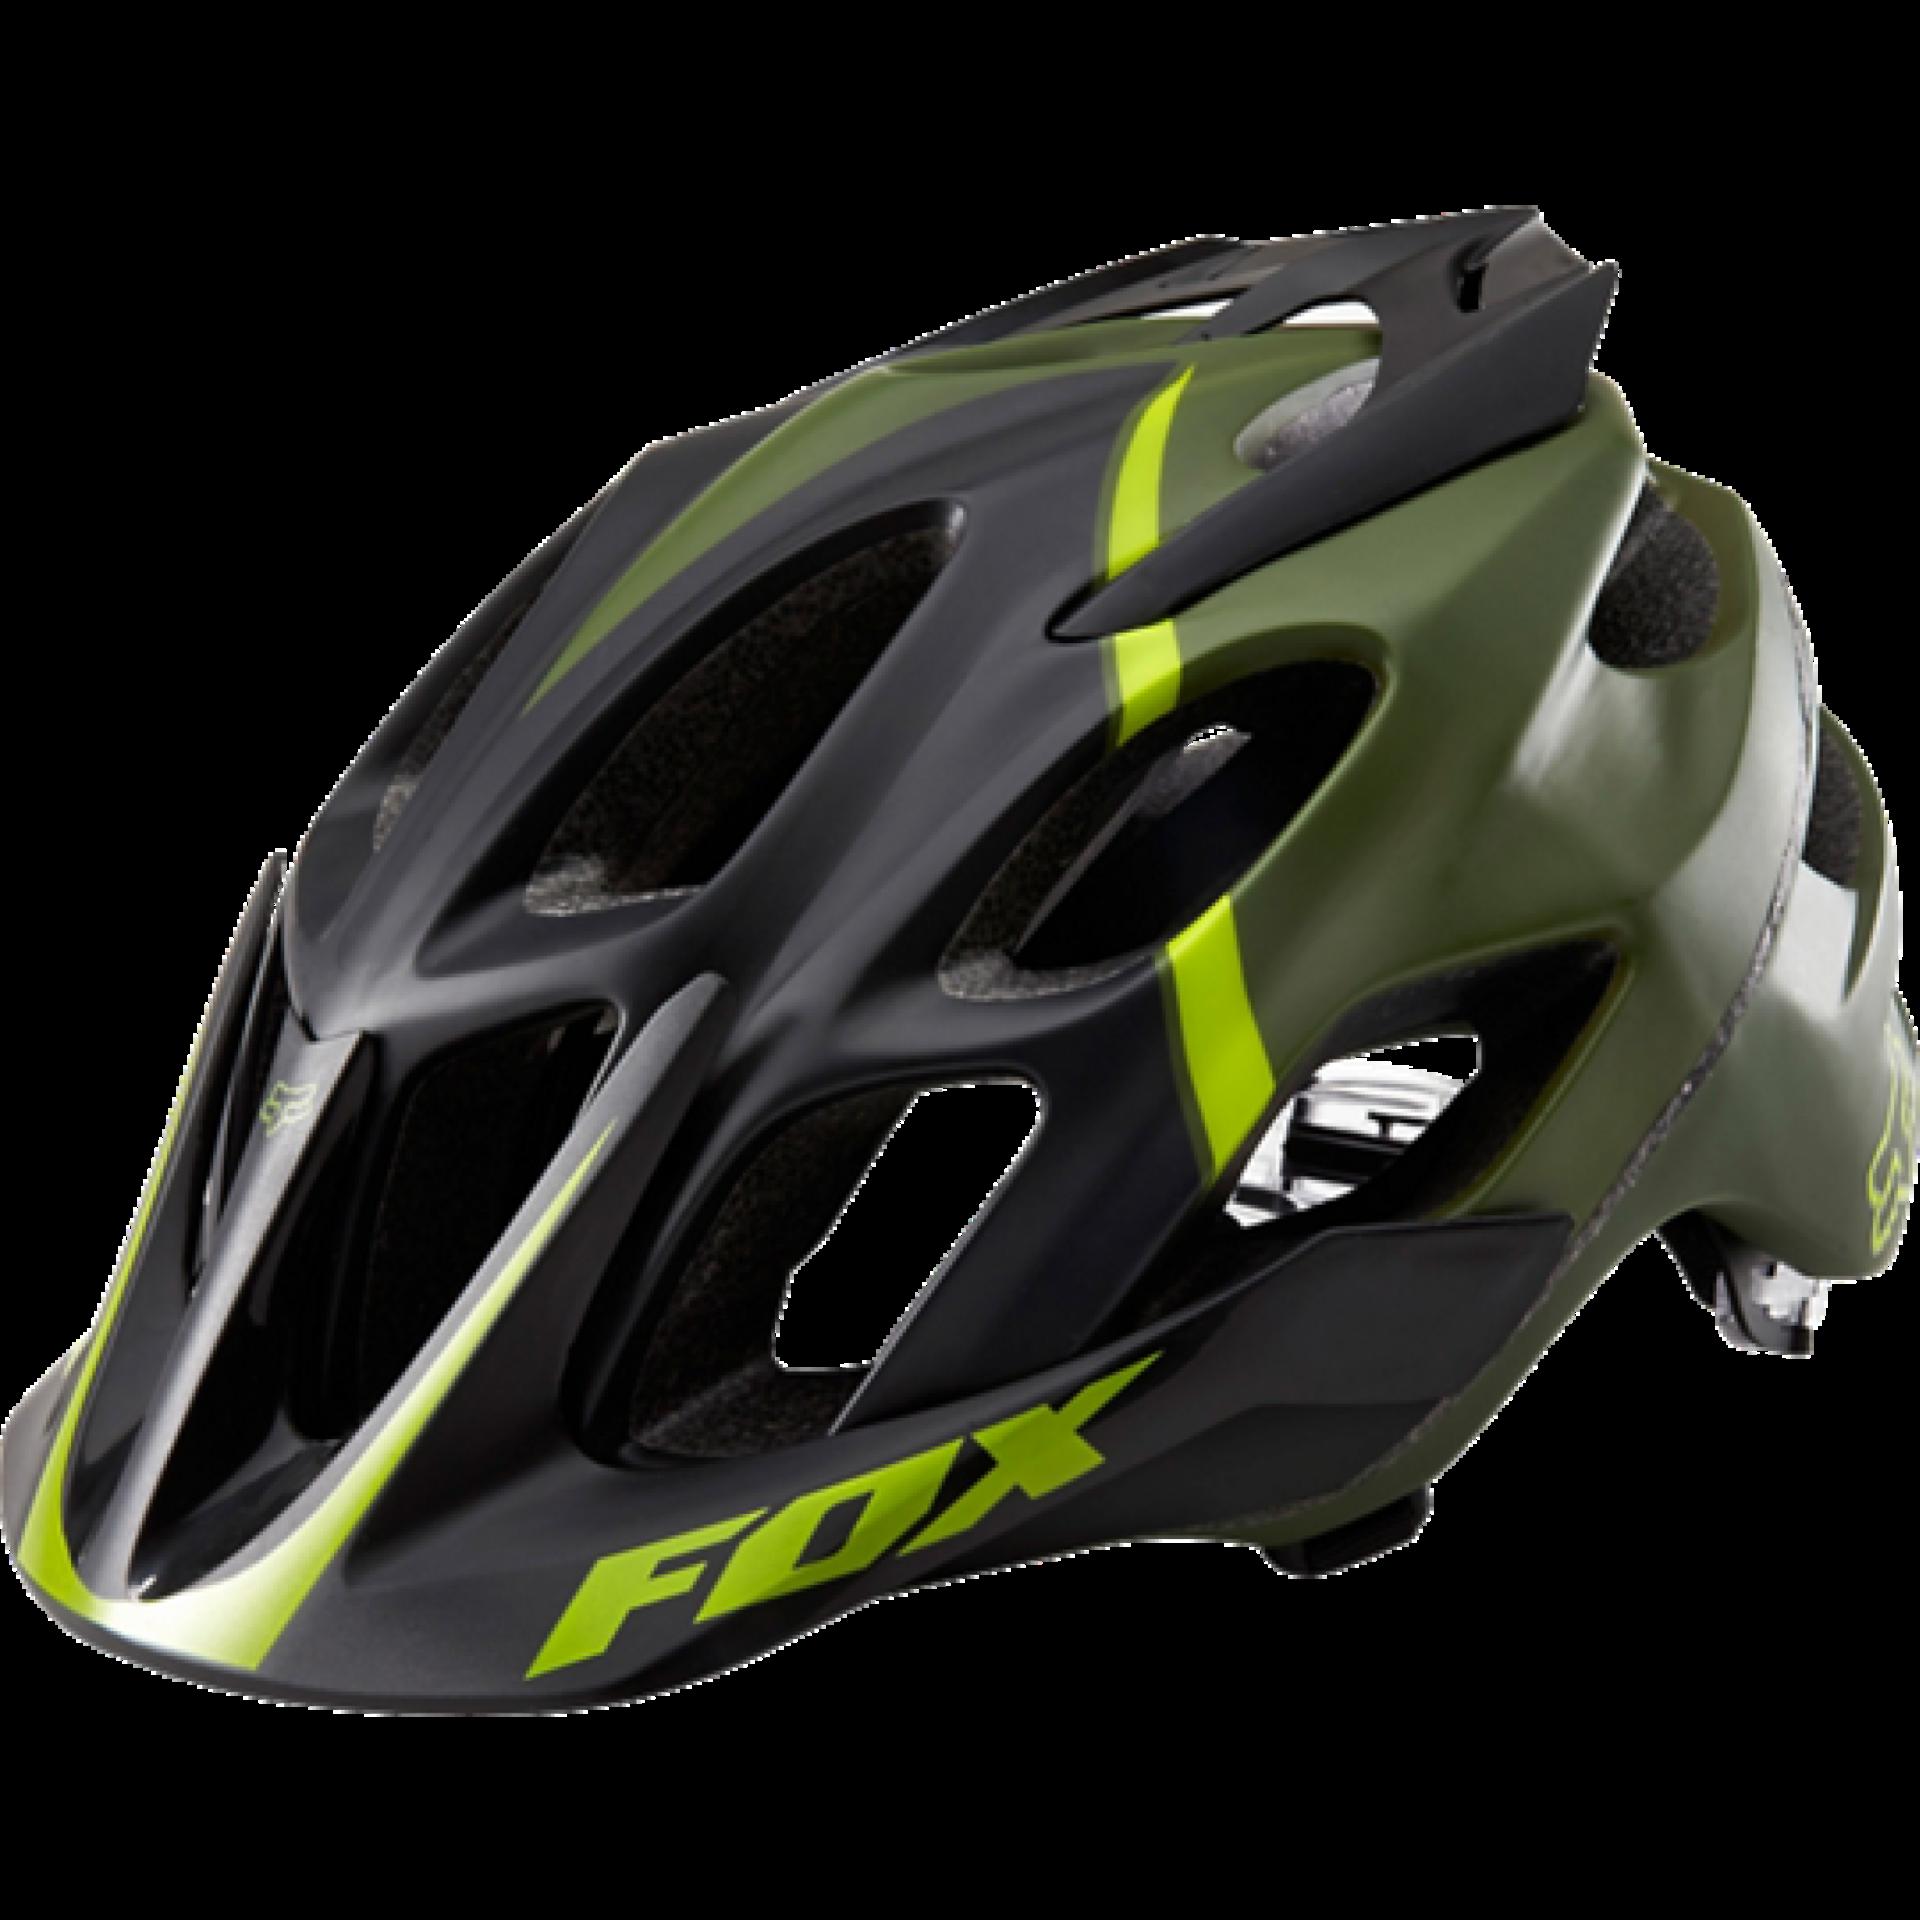 Kask rowerowy Foxhead Flux Helmet zielony przód